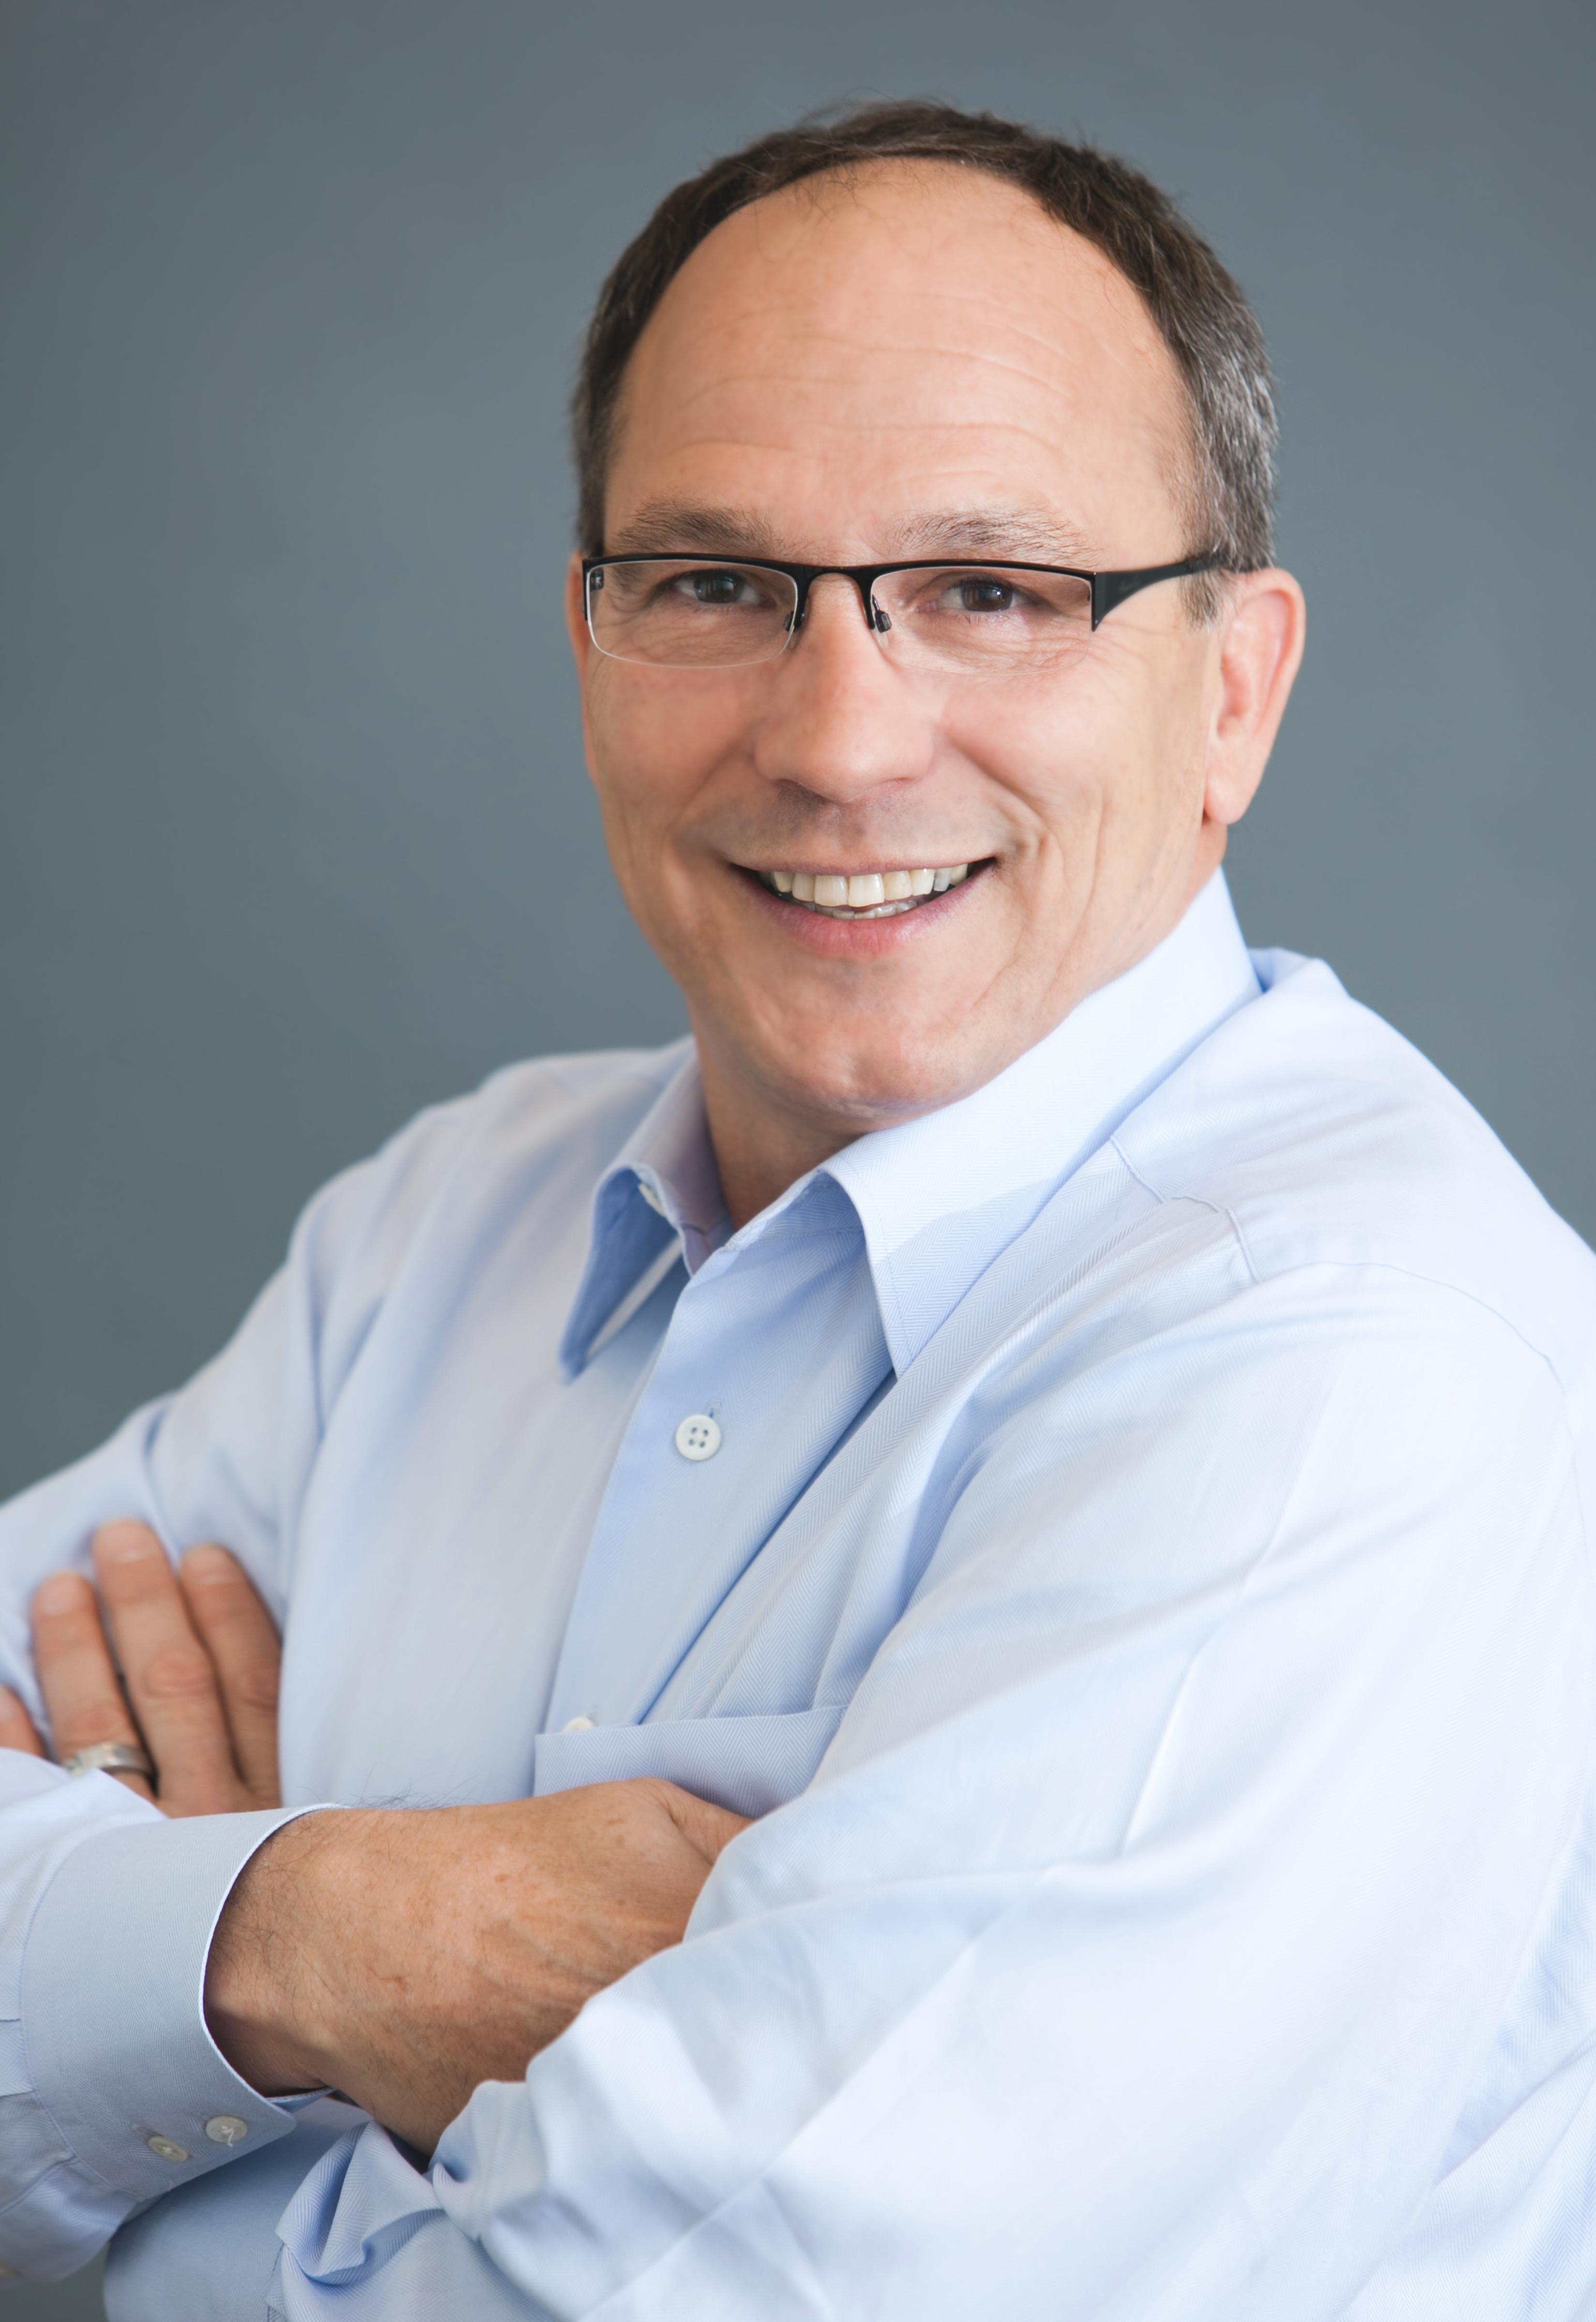 Grant Asplund, Director of Evangelism, Blue Coat Systems